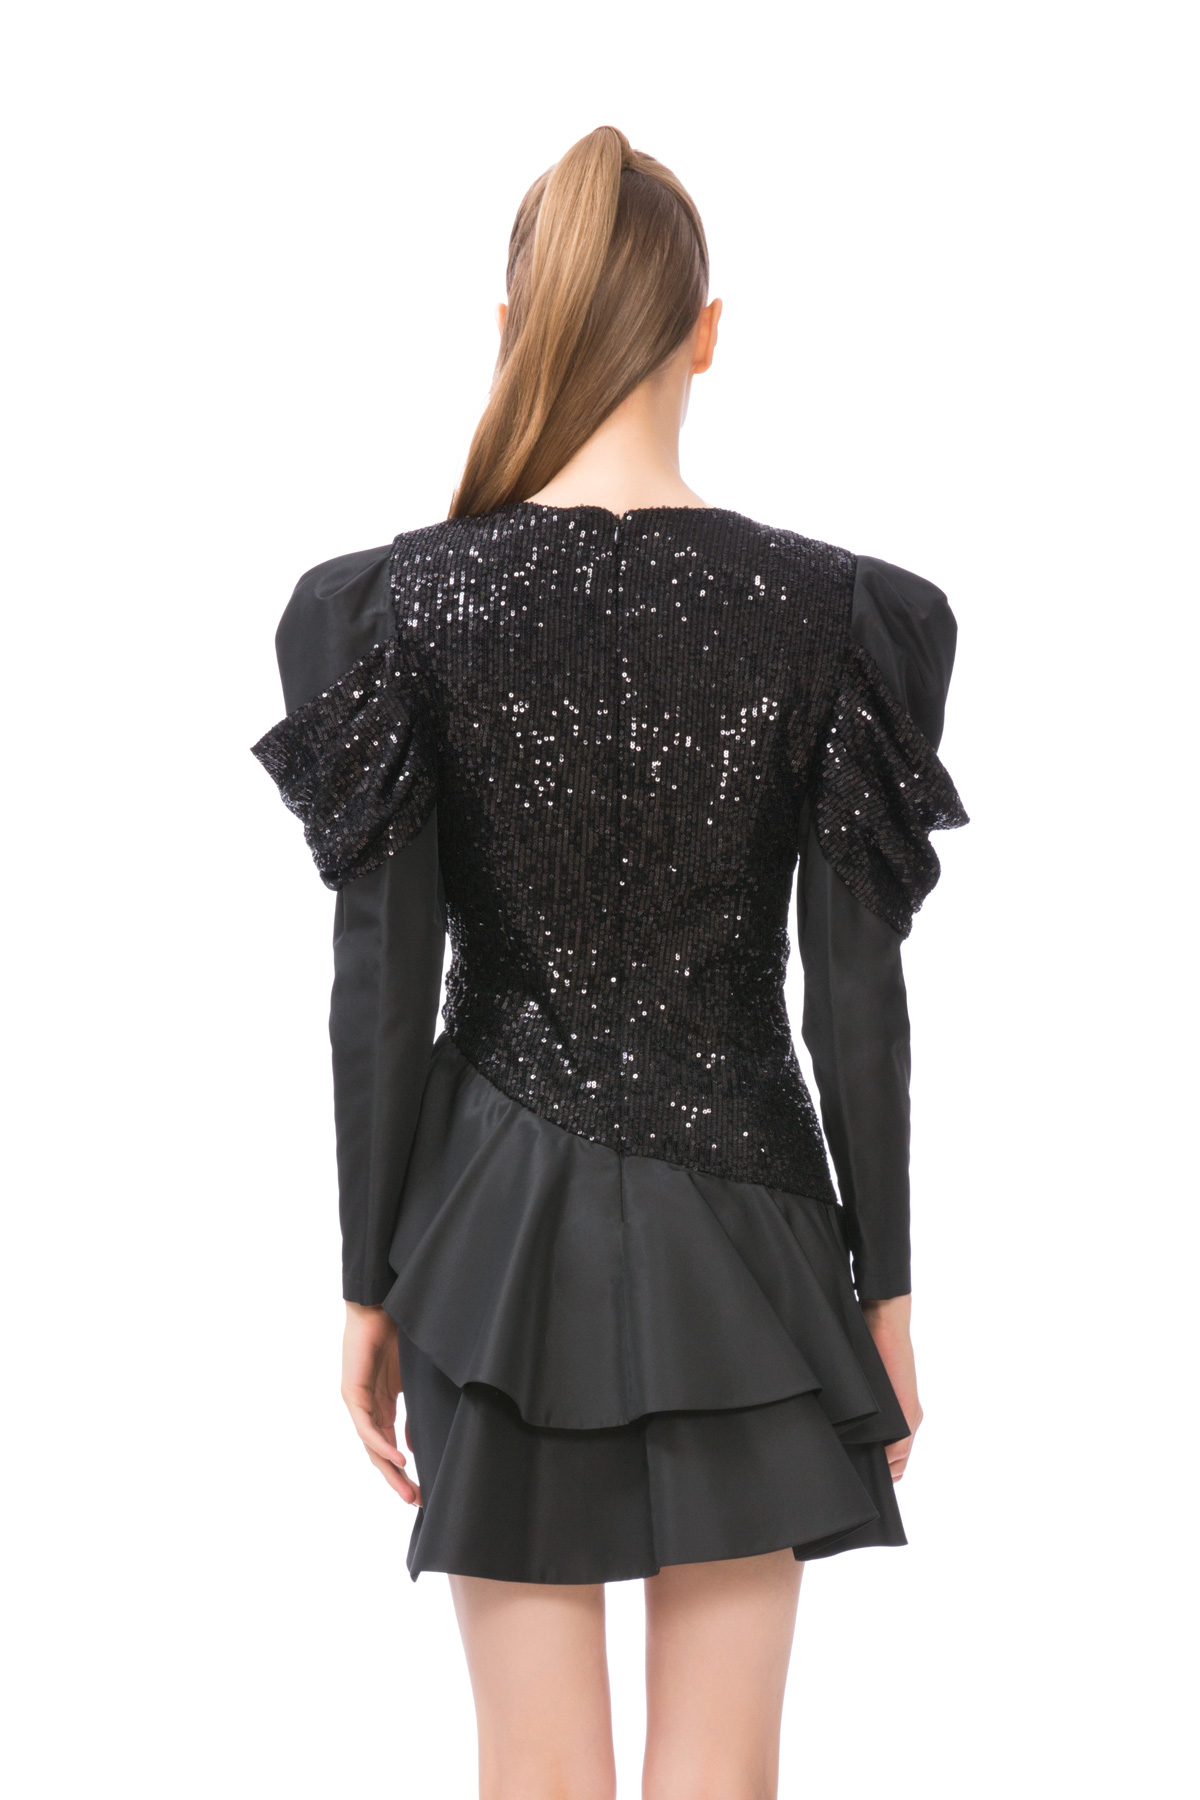 Pul Payet Detaylı Jüliet Kol Mini Siyah Elbise